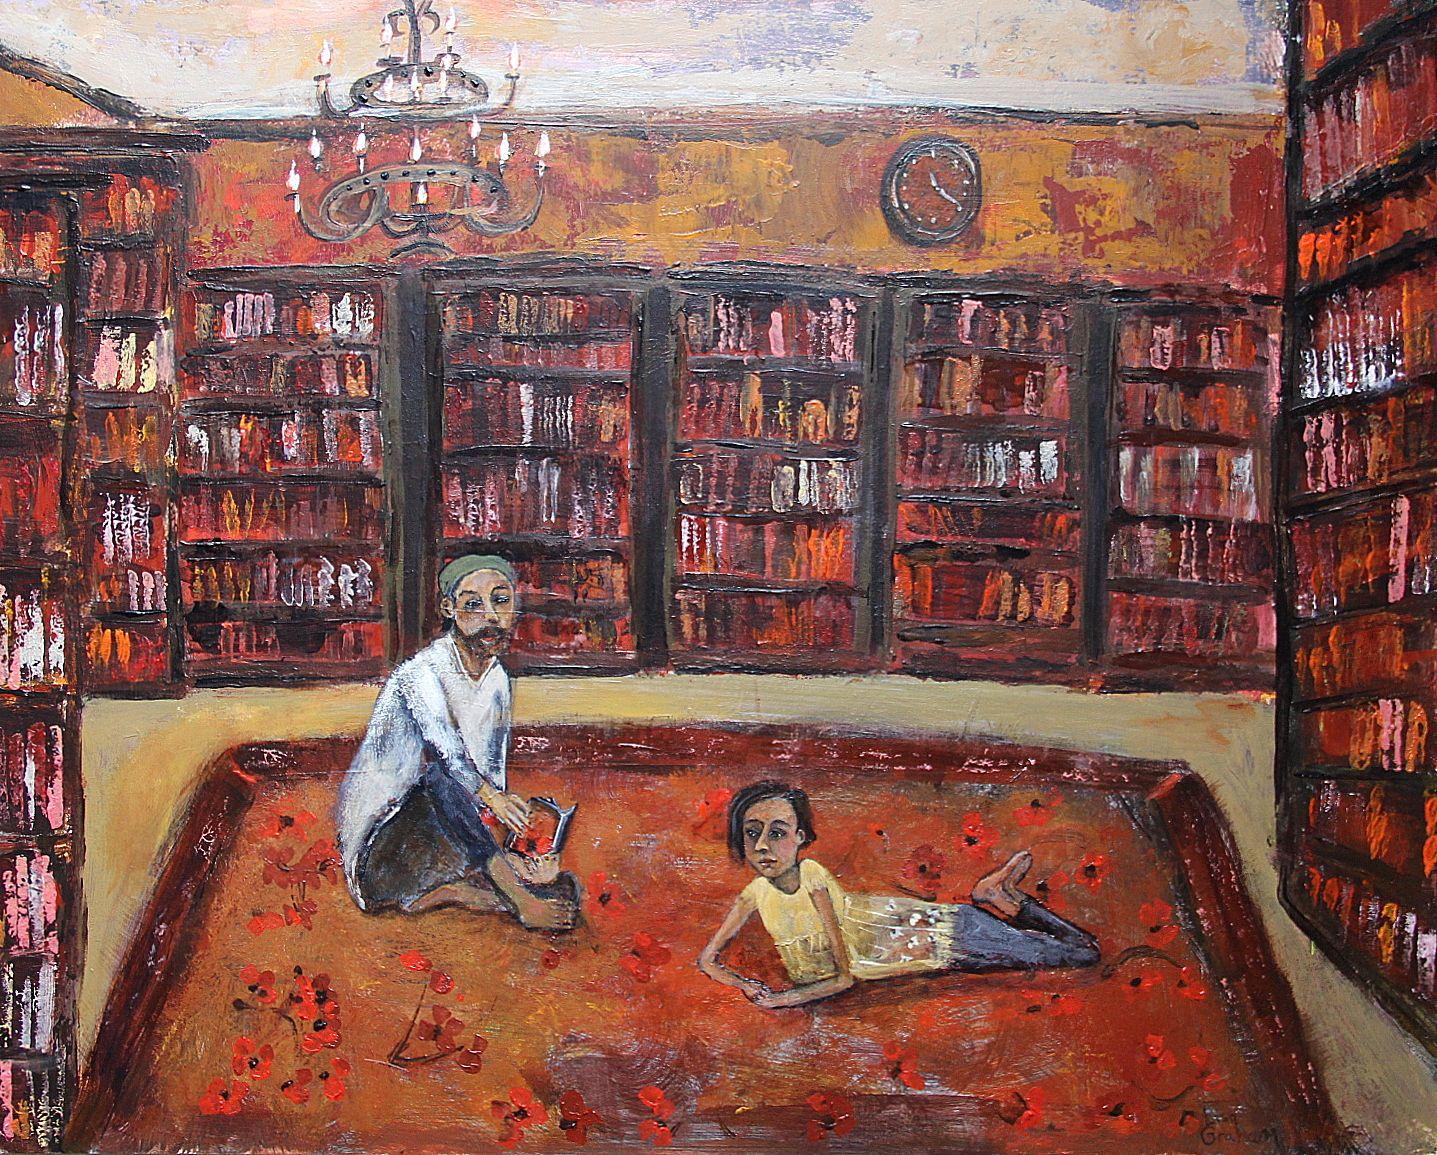 Original Readings At The Dusty Bookshelf Acrylic Painting On 16 X 20 Inch Gessoed Panel Unframed Art